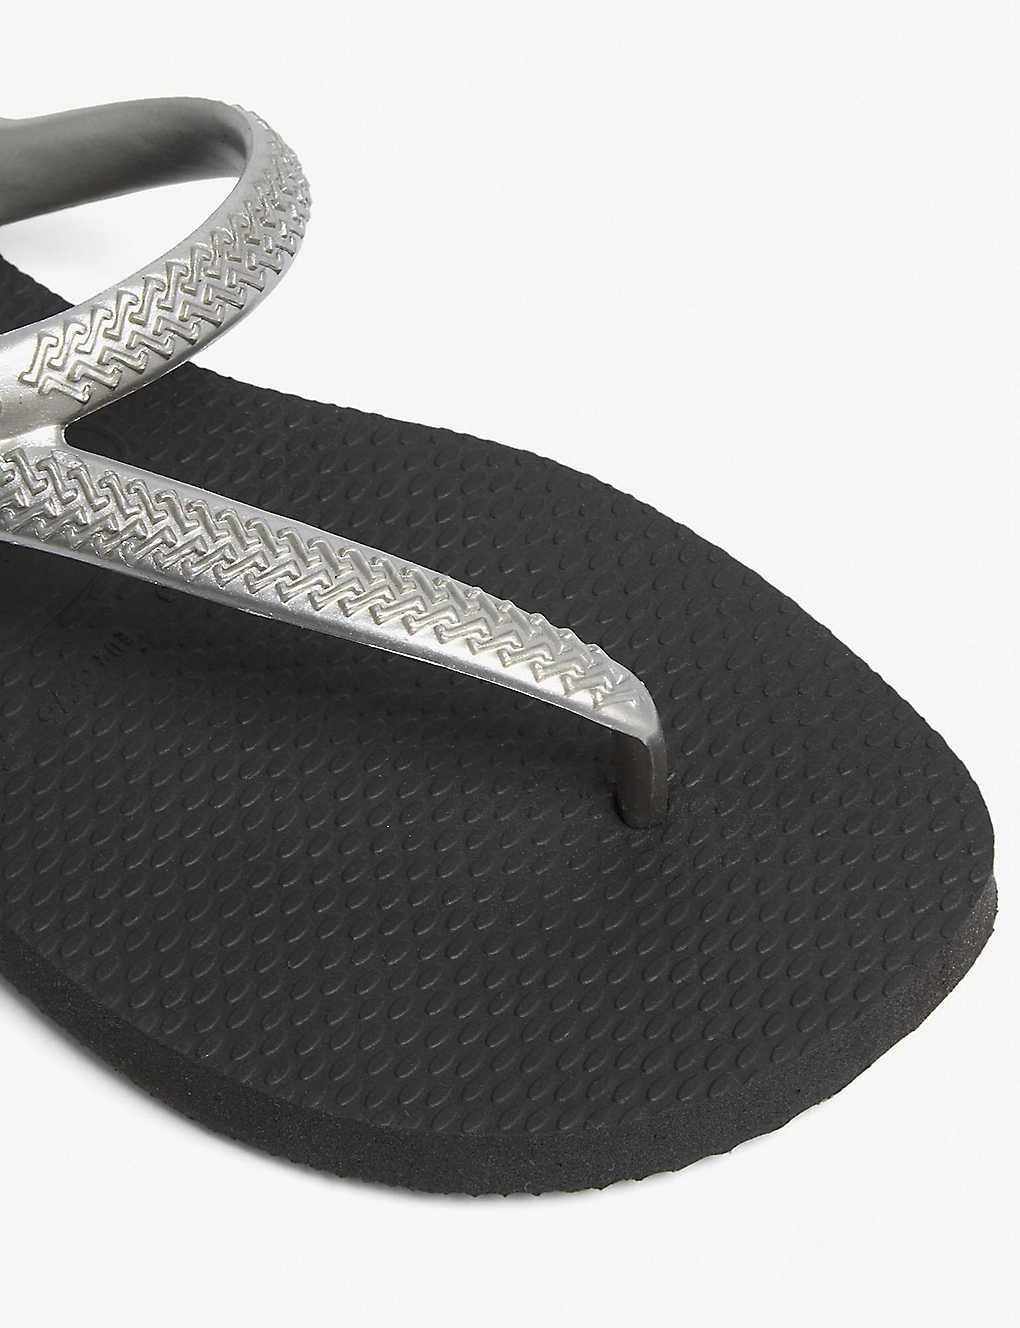 108801a26 HAVAIANAS - Flash Urban rubber sandals